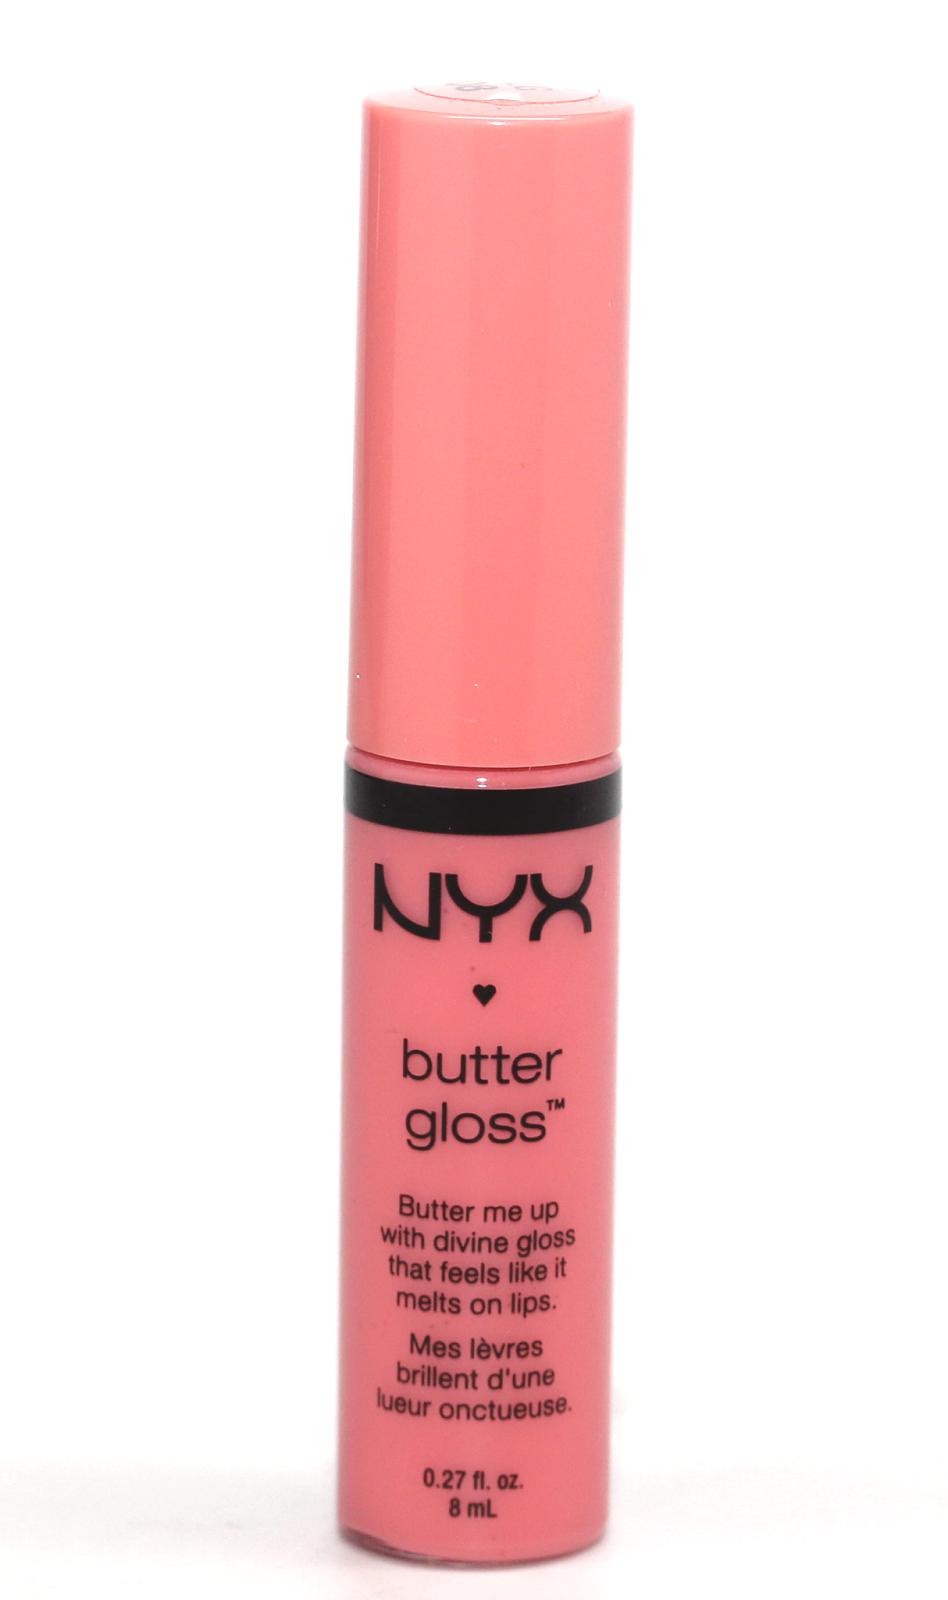 Nyx As Kylie Dupes For 10: Makeup, Beauty & Fashion: SNEAK PEEK: NYX COSMETICS